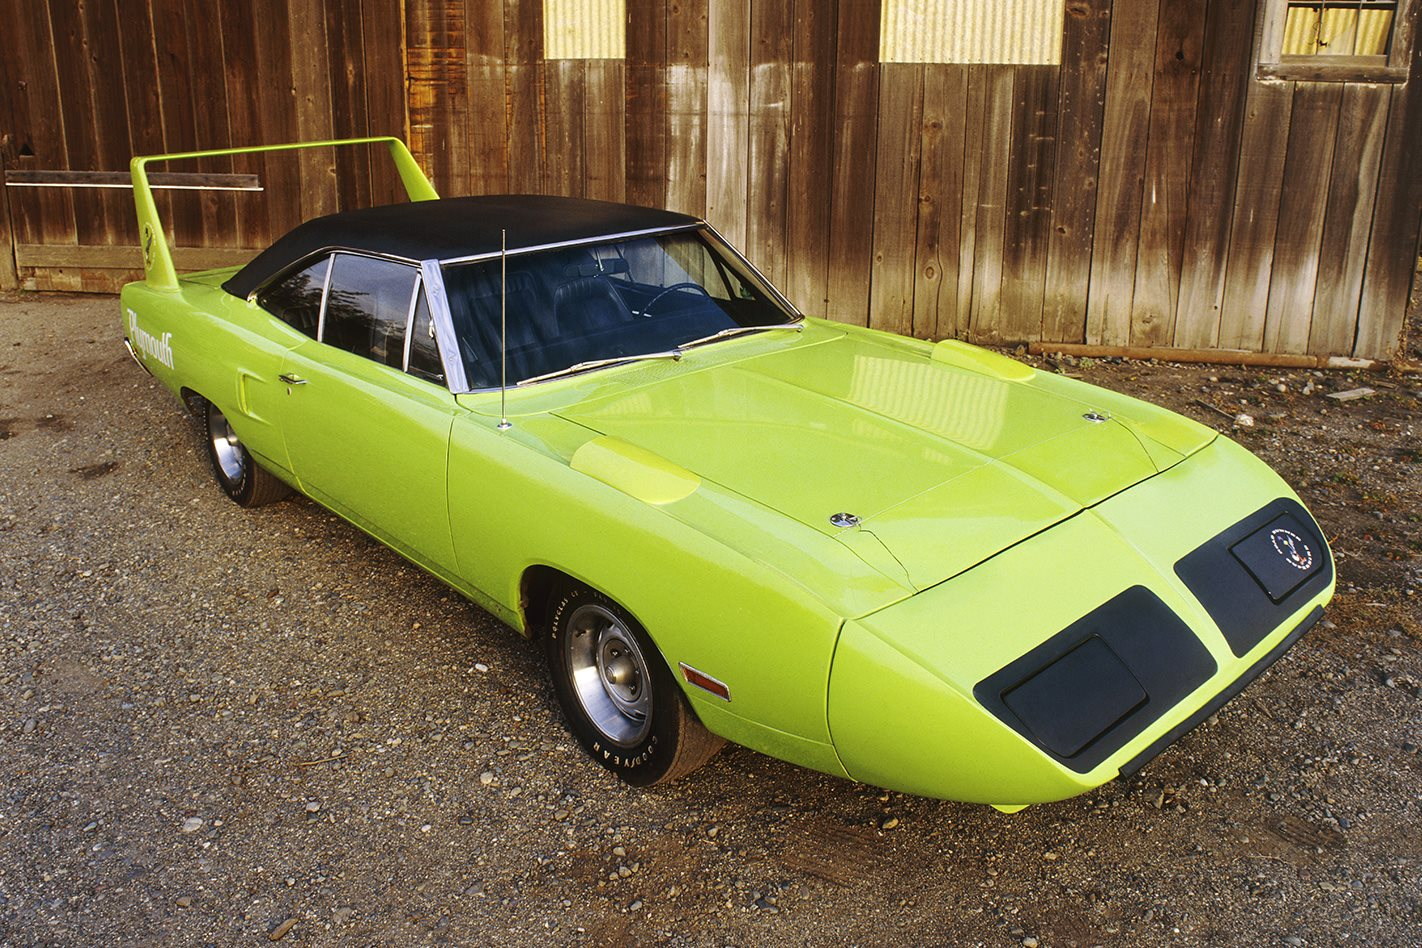 426 Hemi powered 1970 Plymouth Superbird